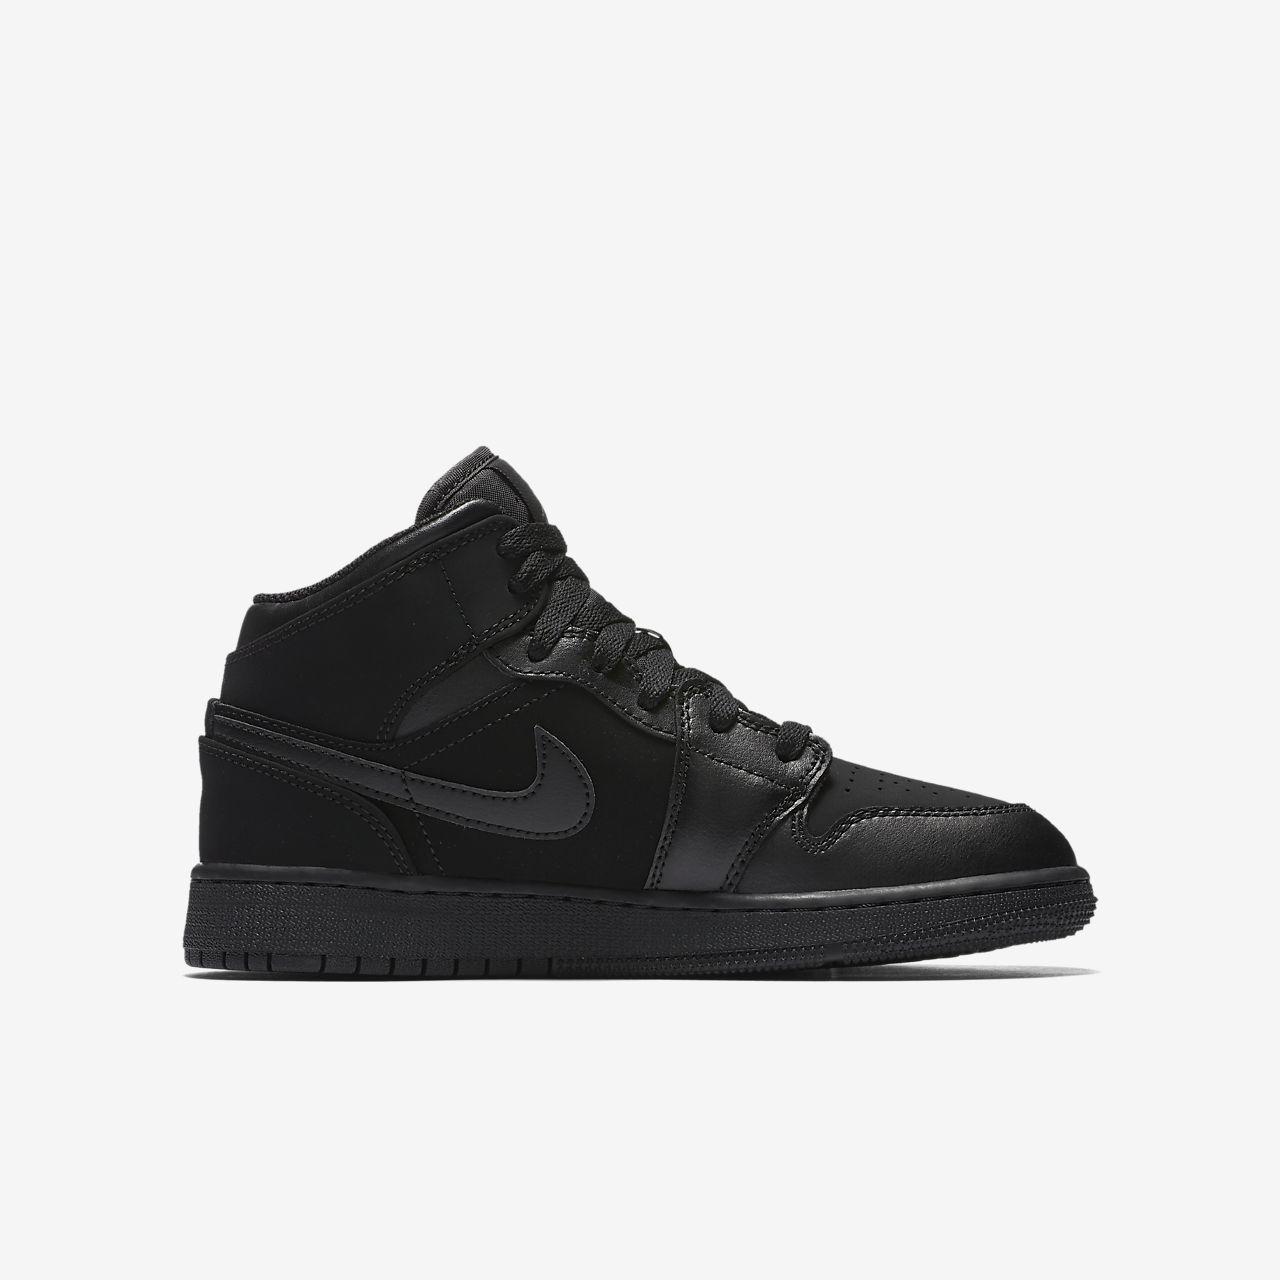 huge discount 785ef 745cc ... Air Jordan 1 Mid Schuh für ältere Kinder